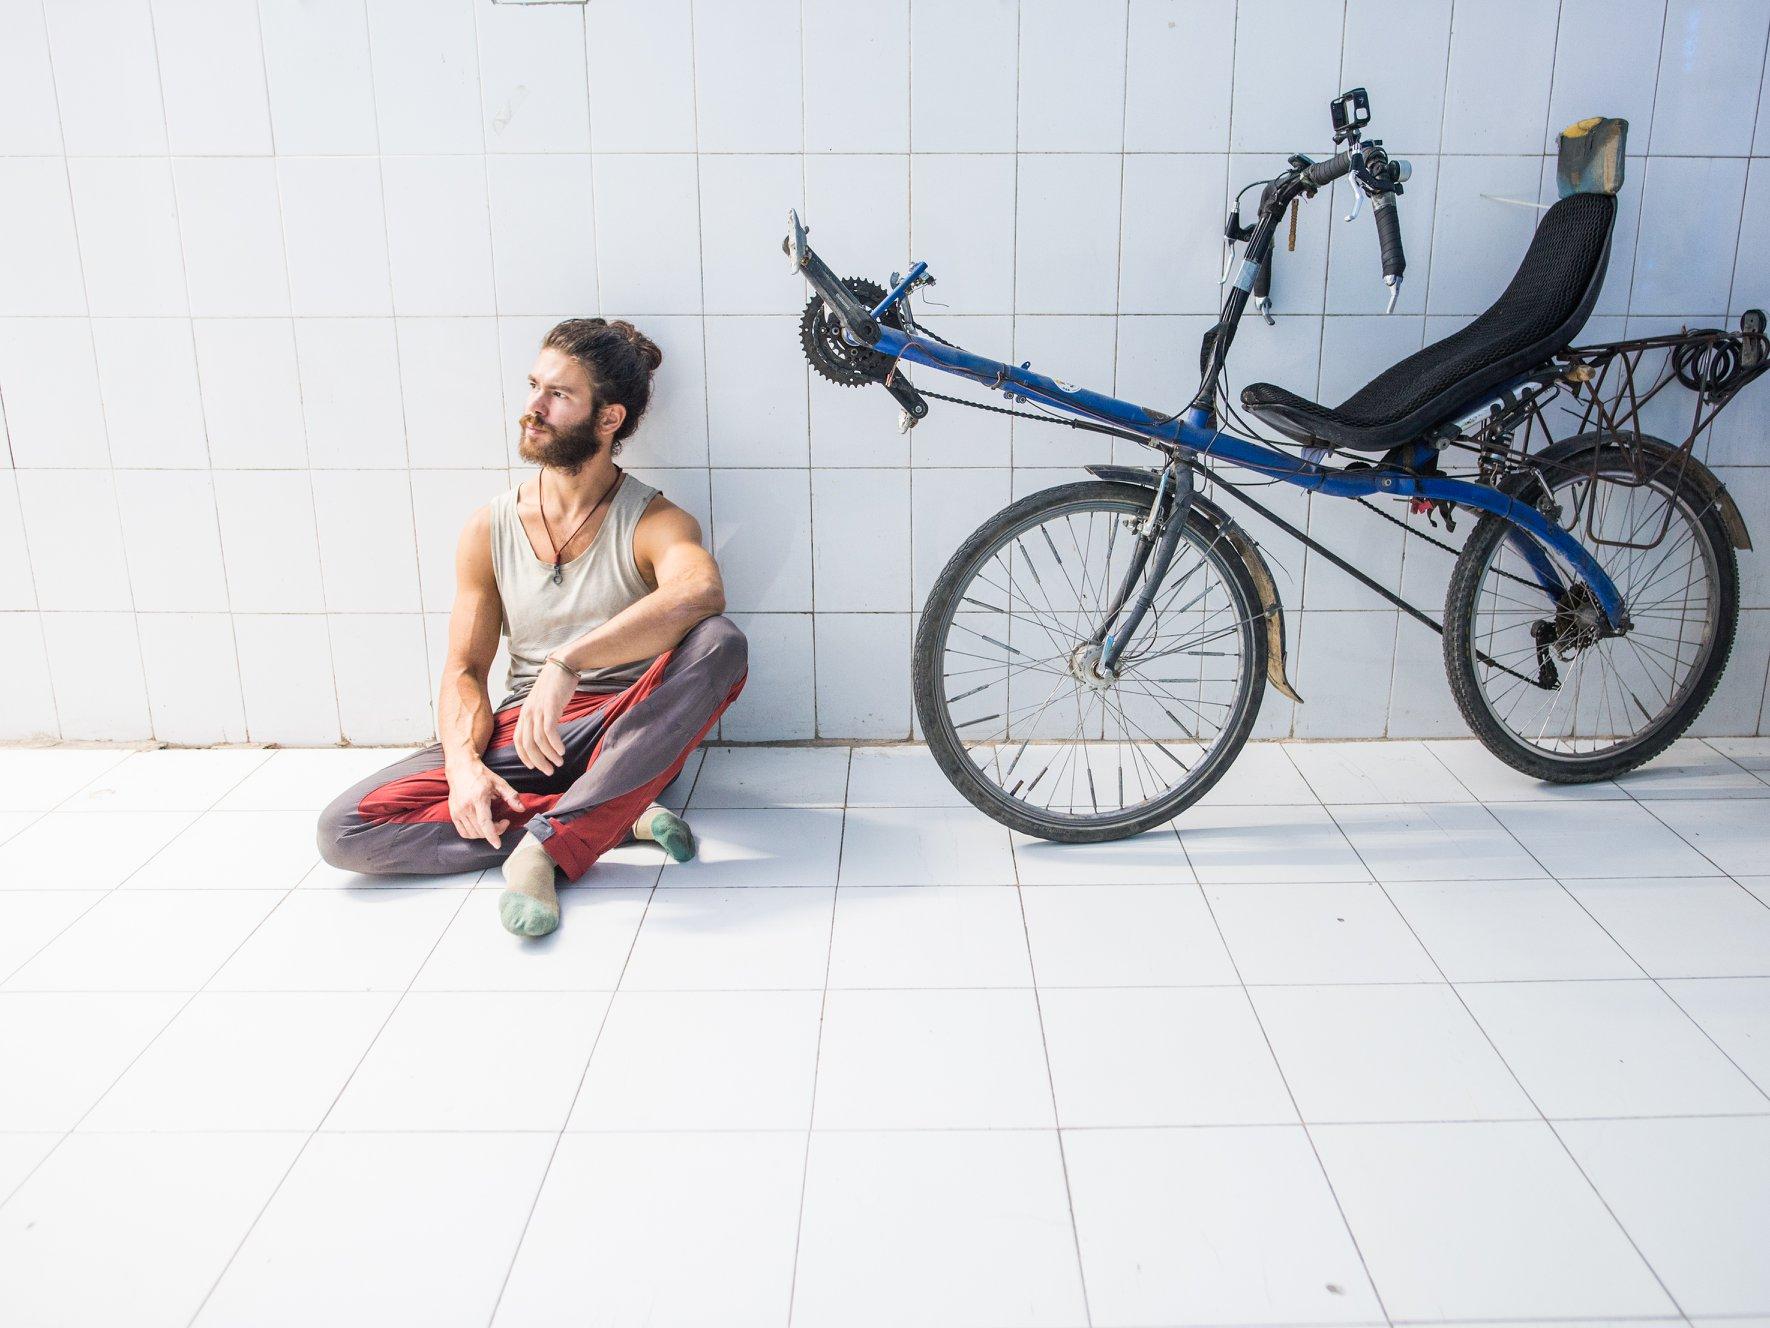 Hungarian Adventurer Who Followed Sándor Kőrösi Csoma's Way to Tibet, Stuck in Hospital Due to Coronavirus post's picture